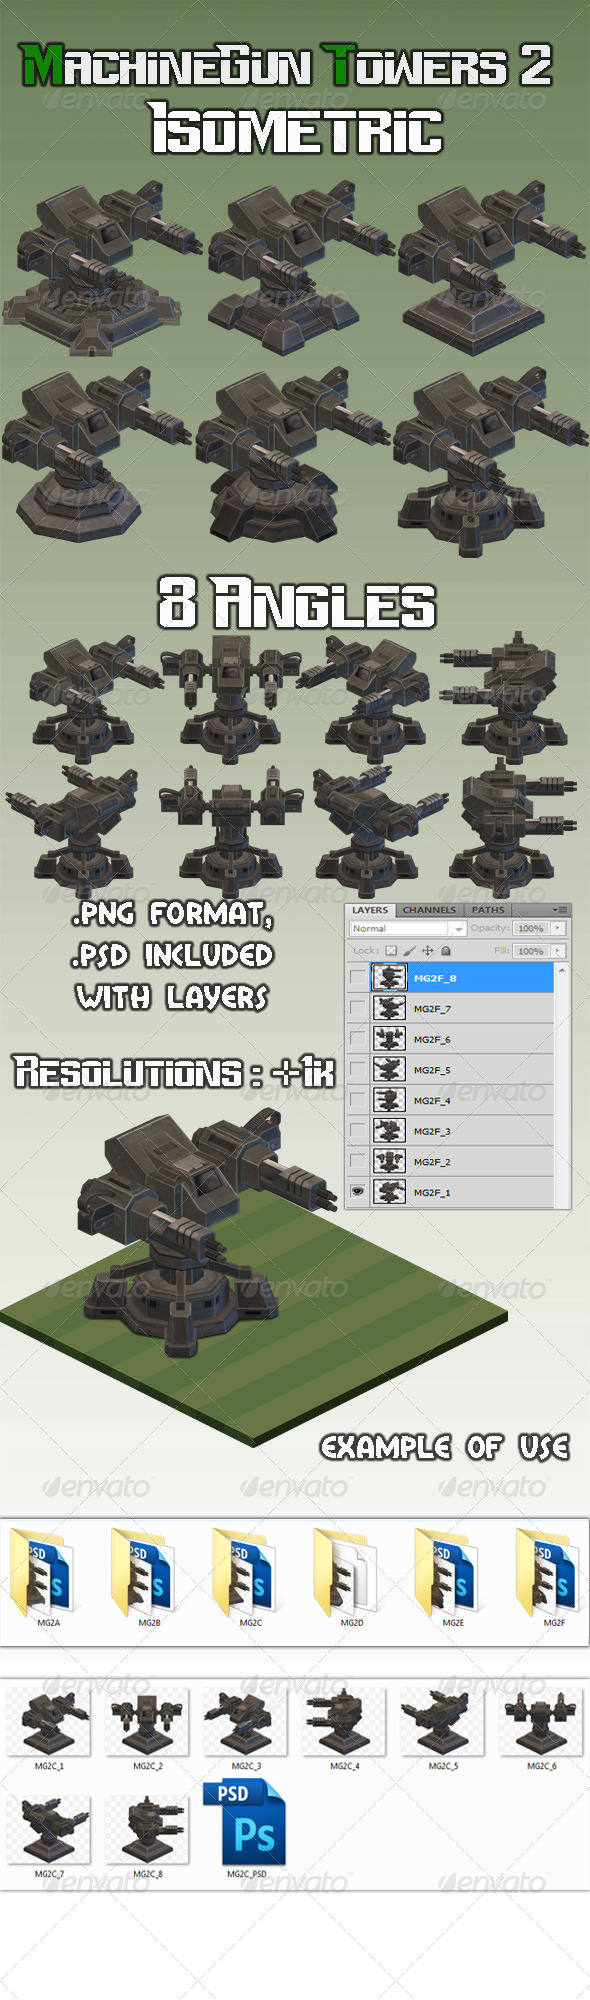 GraphicRiver Machinegun Turret 2 Isometric 7963097